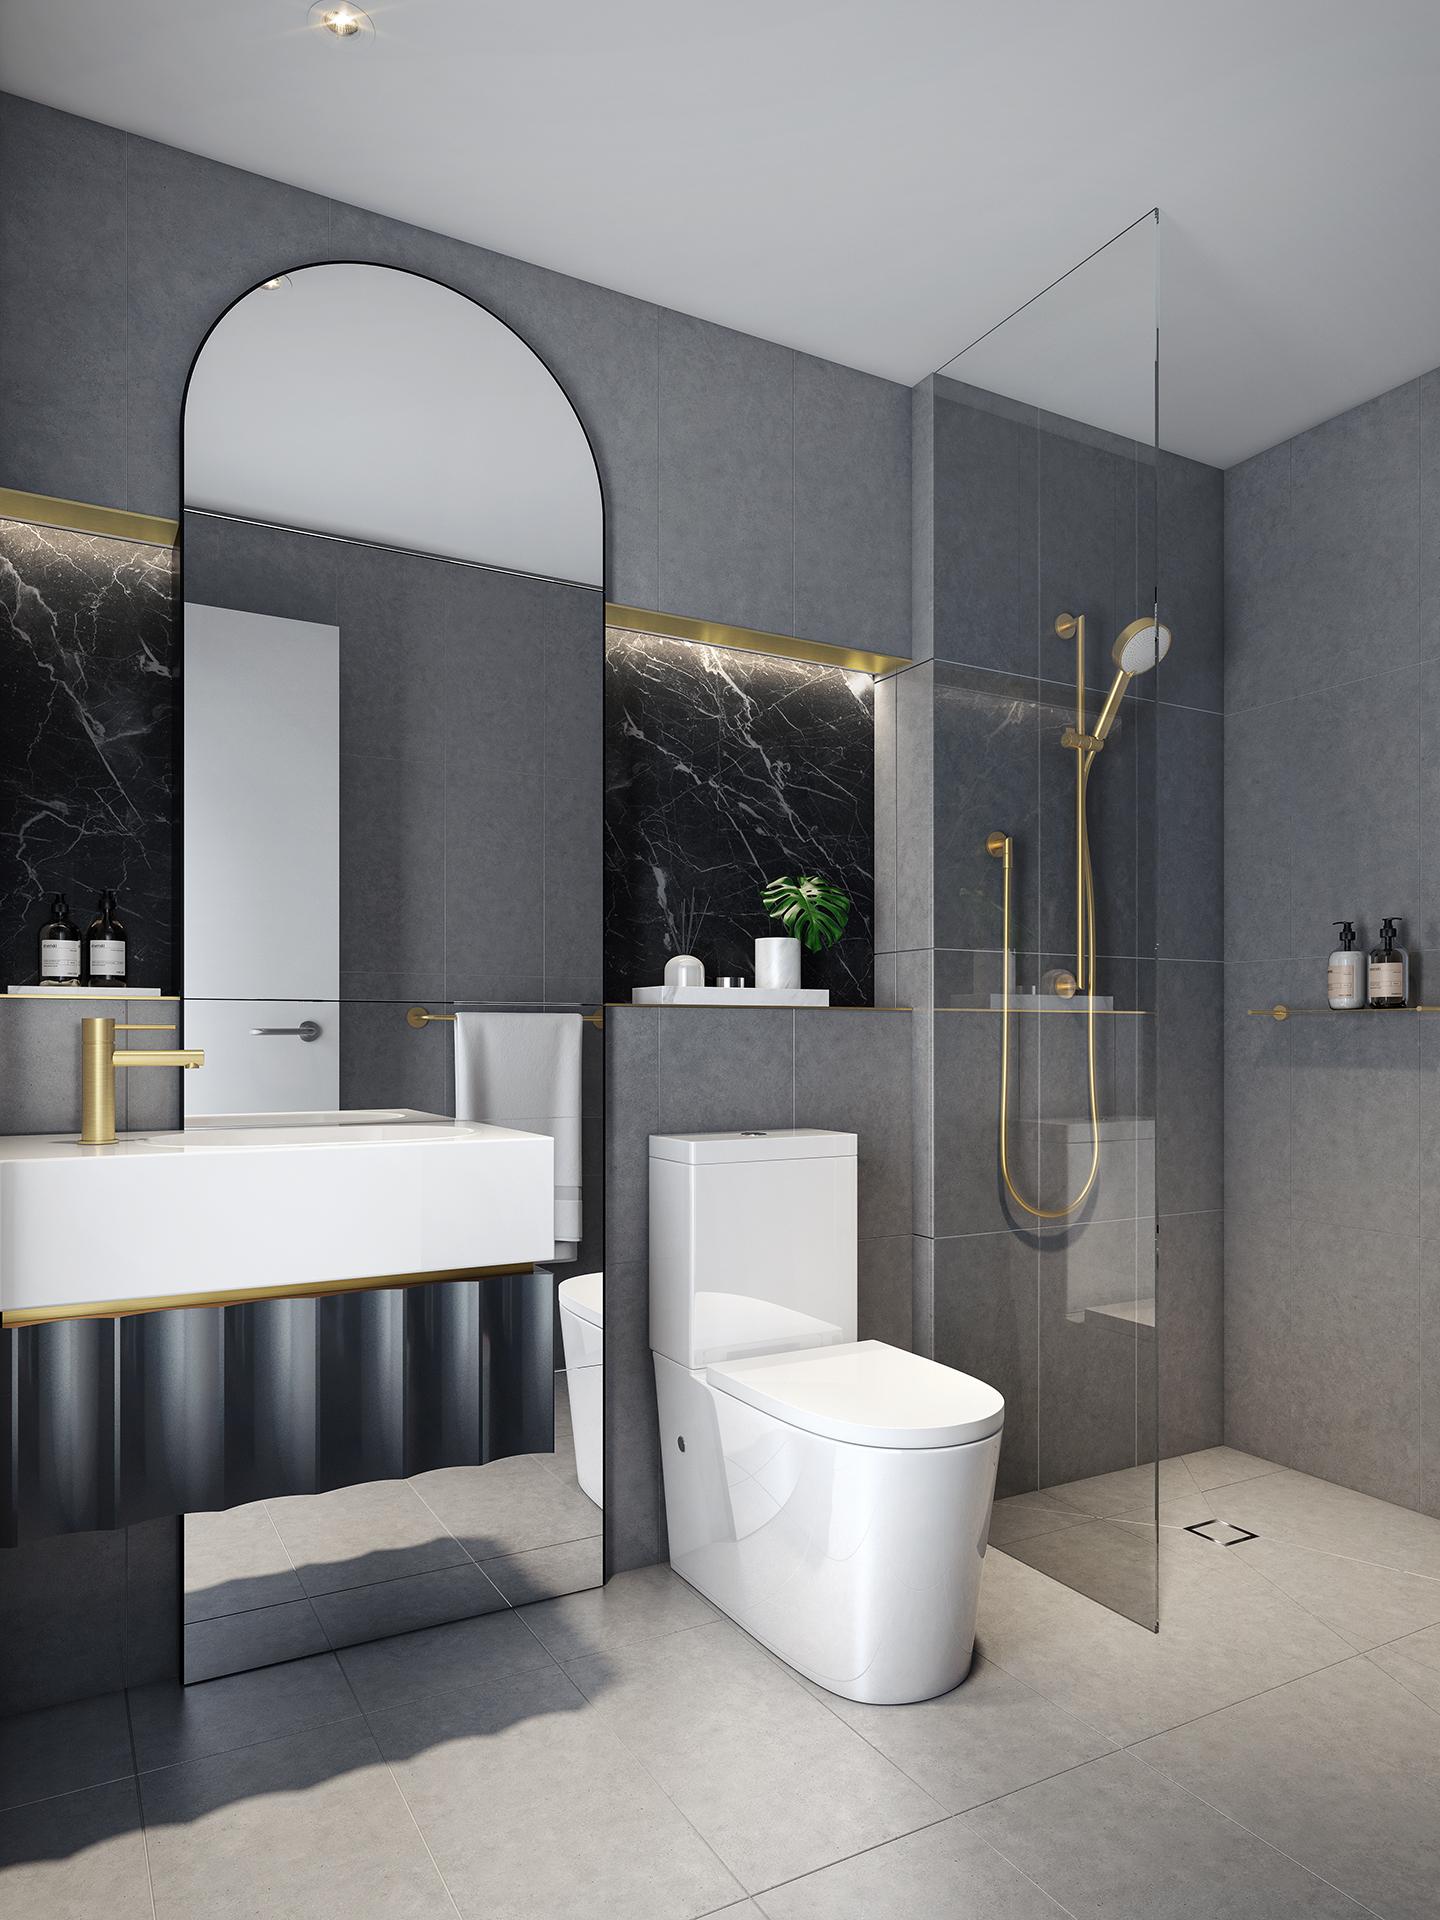 HOLD9998_Cobden St_IN03B_Apartment Bathr